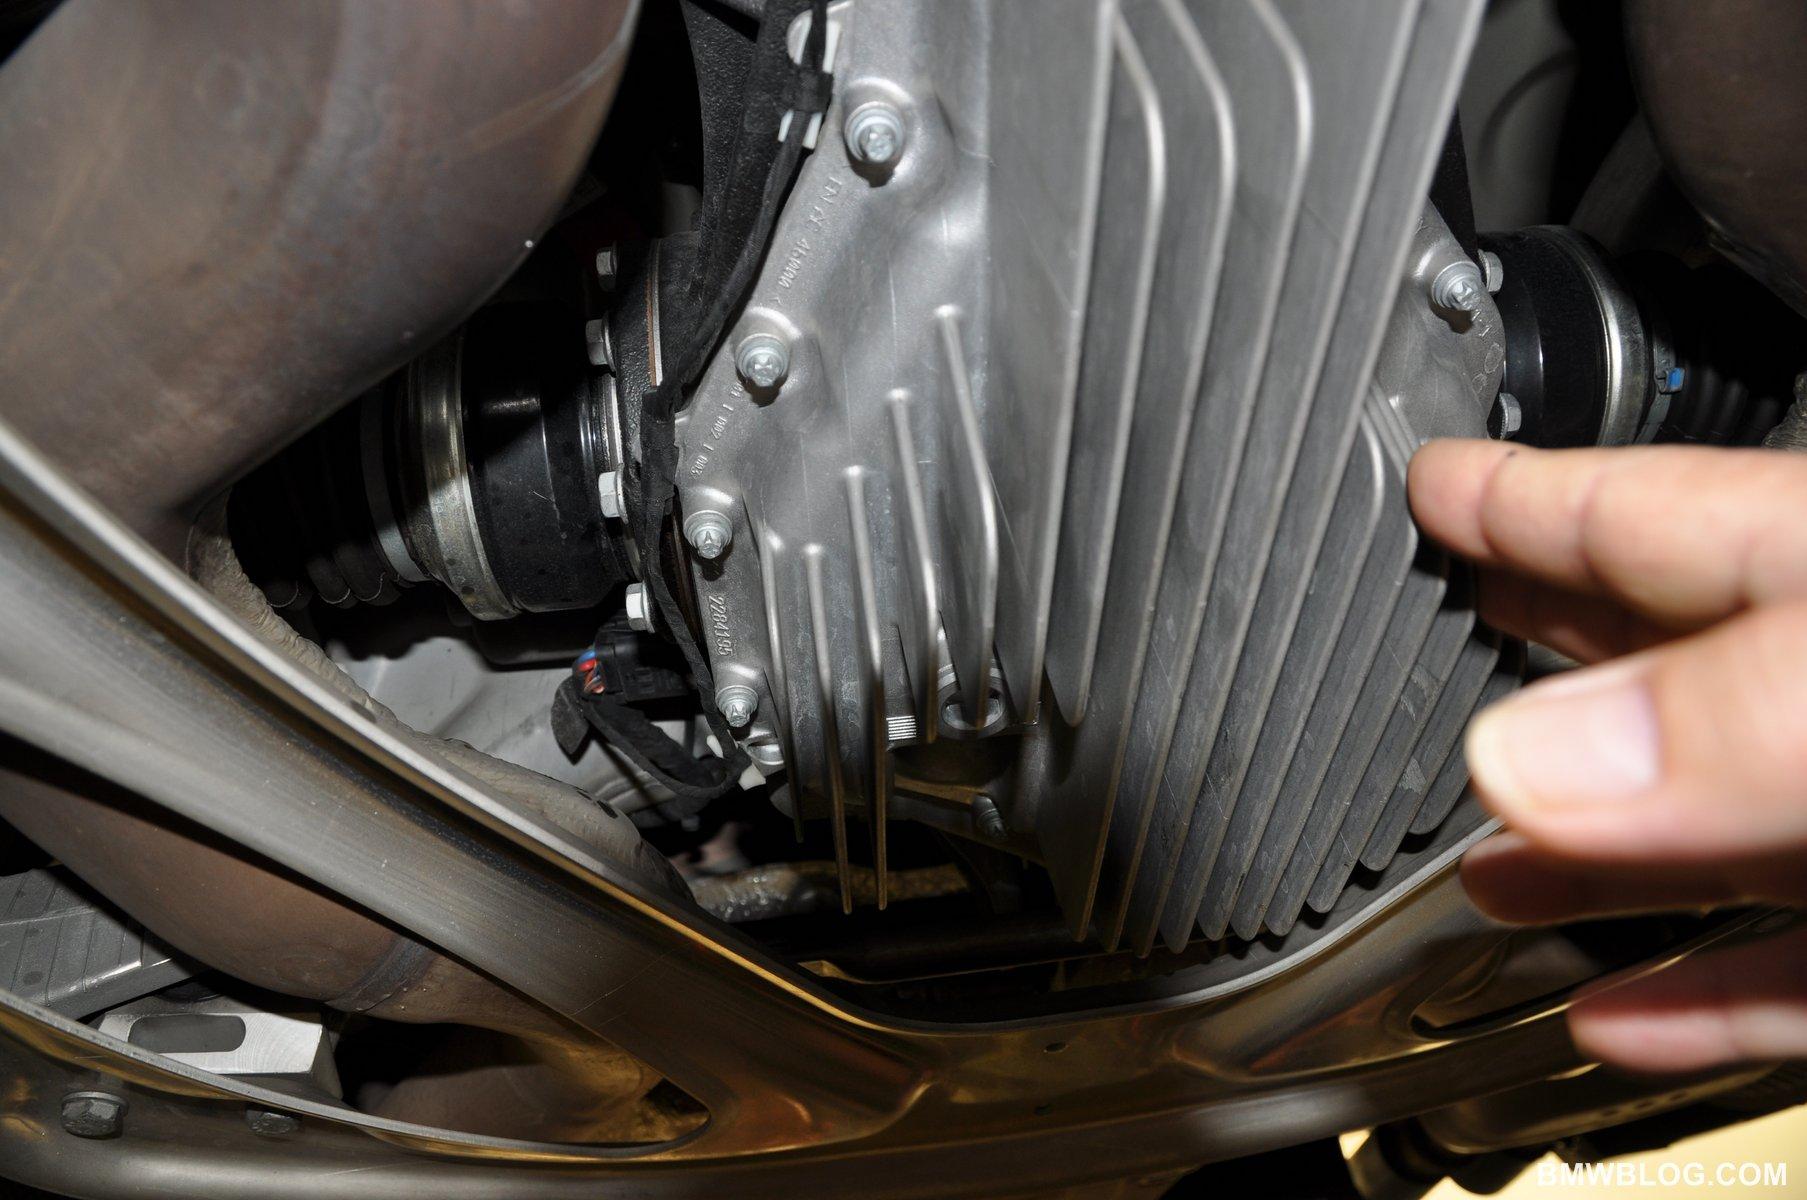 24 hr nurburgring BMW 591